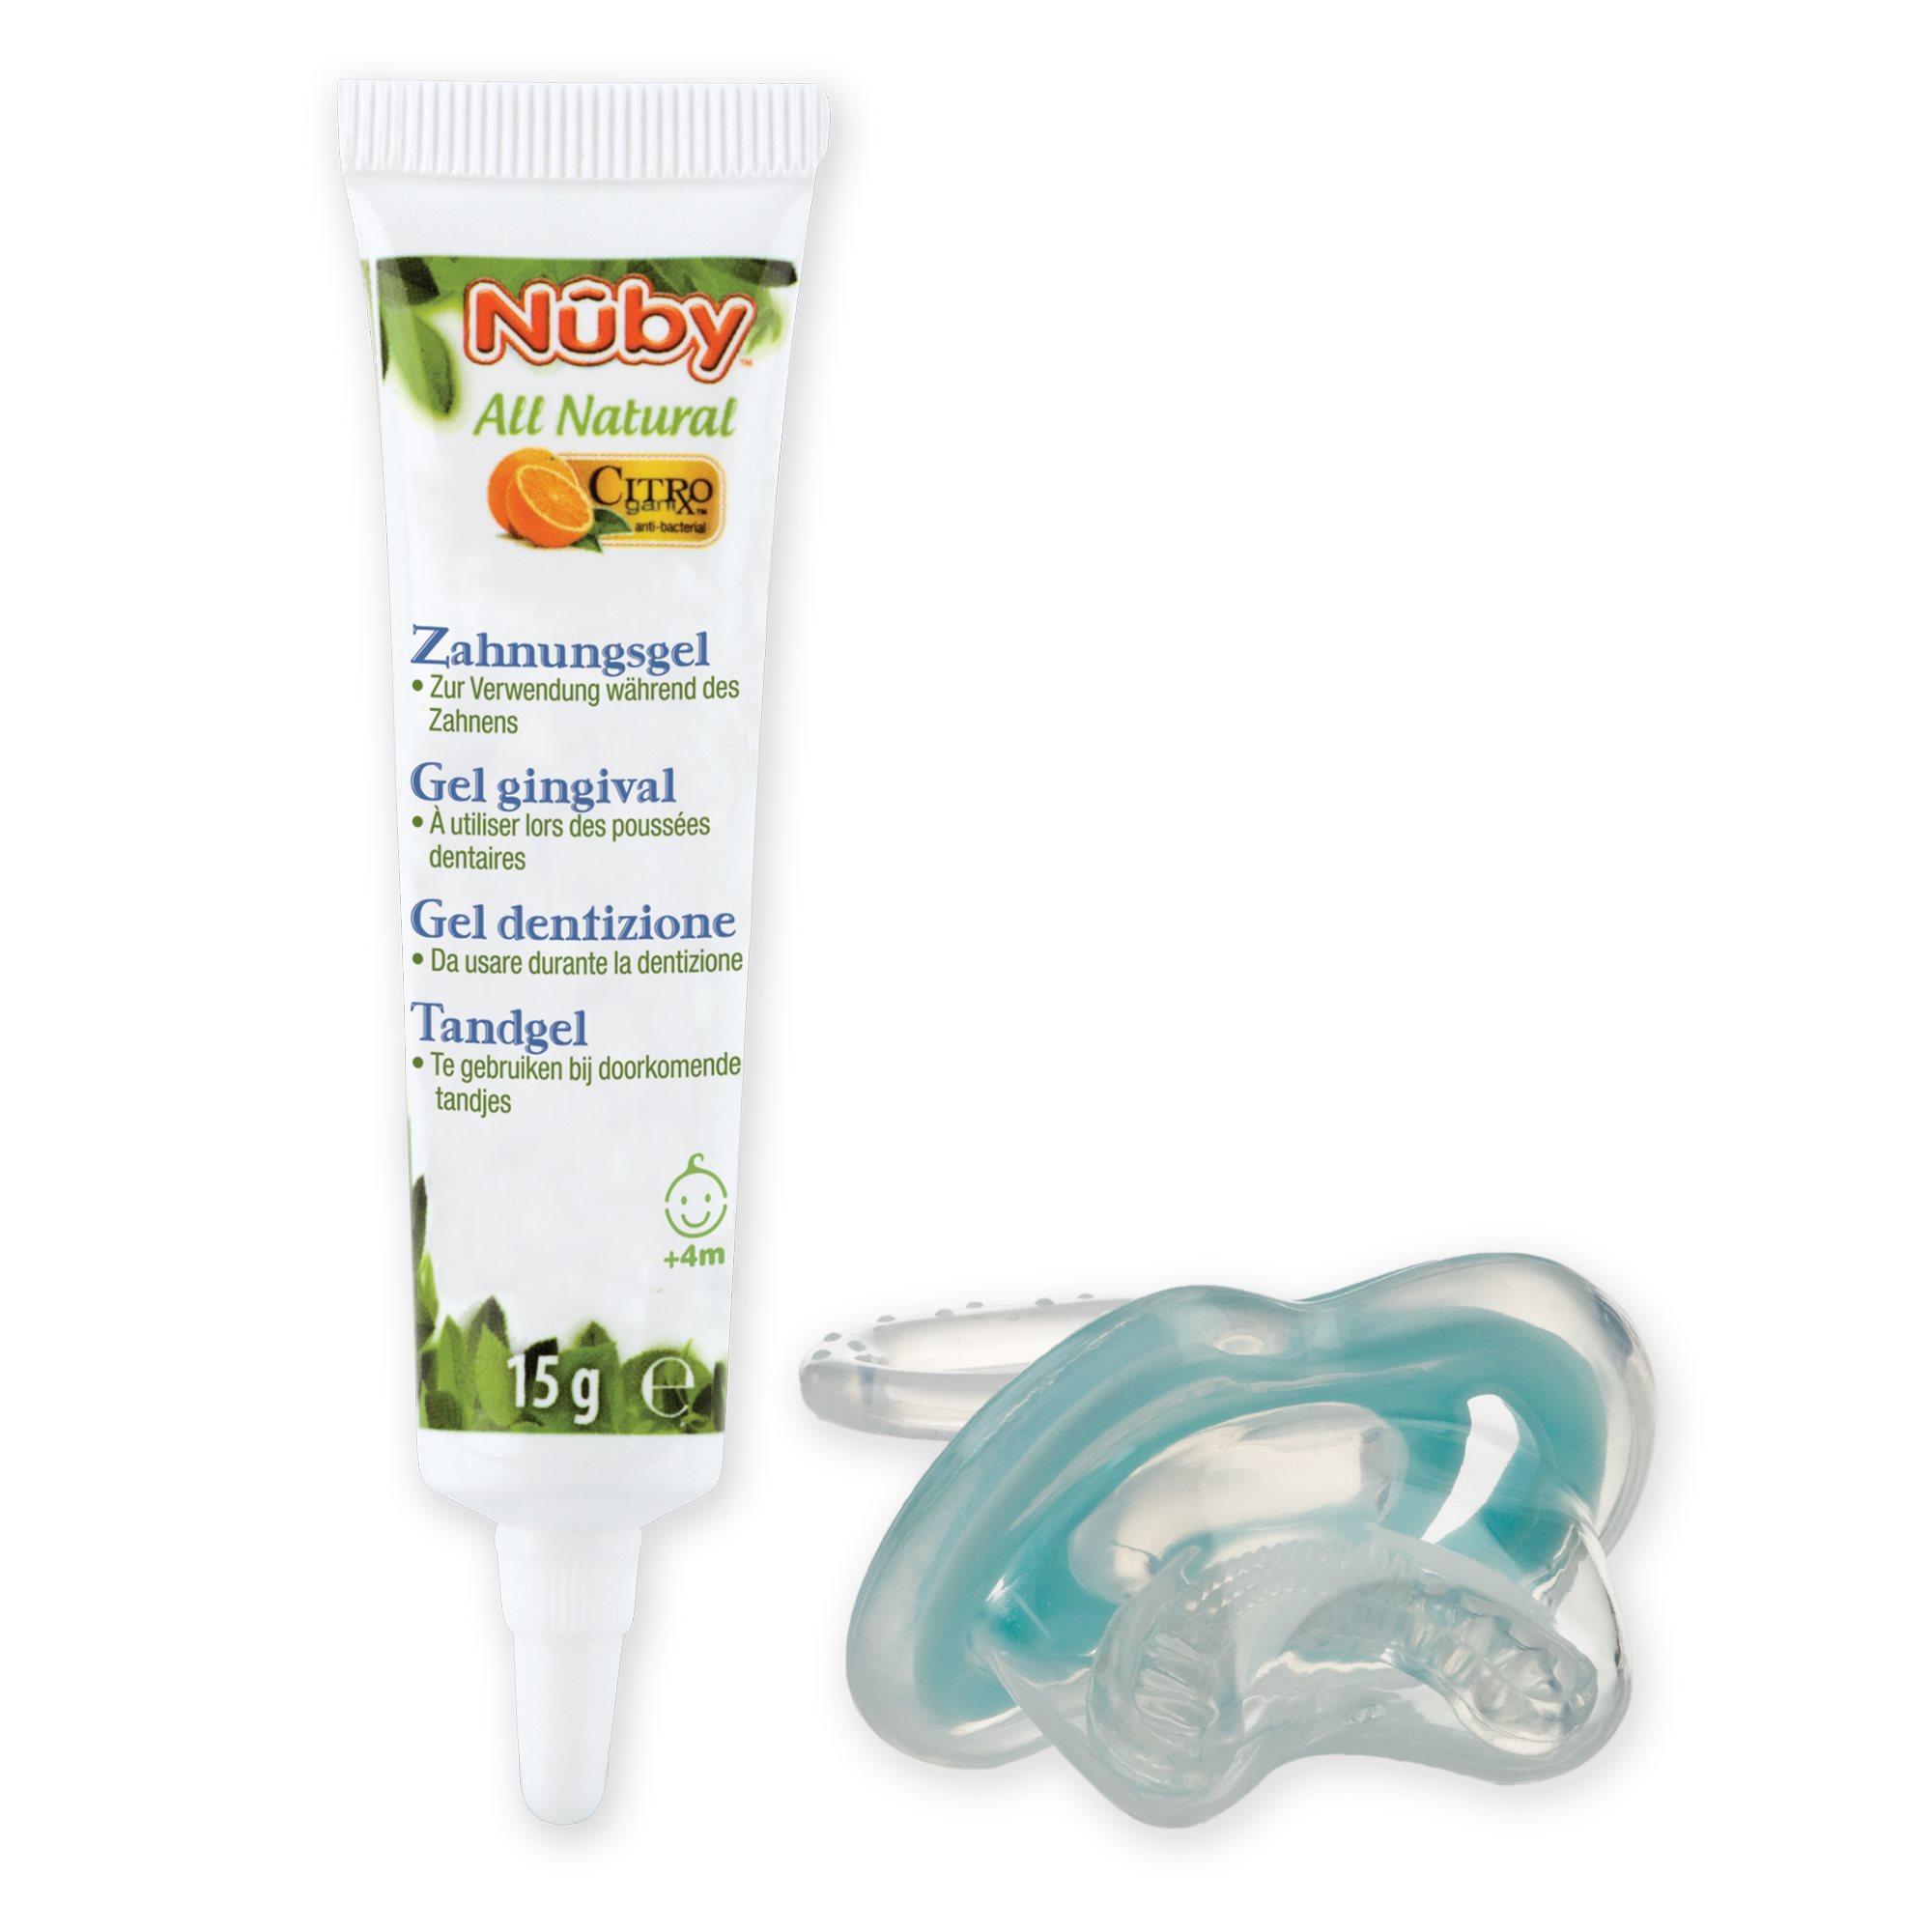 15 g Nuby CG23015ARENPOSP Gel de Dentici/ón Citroganix y Gum Eez